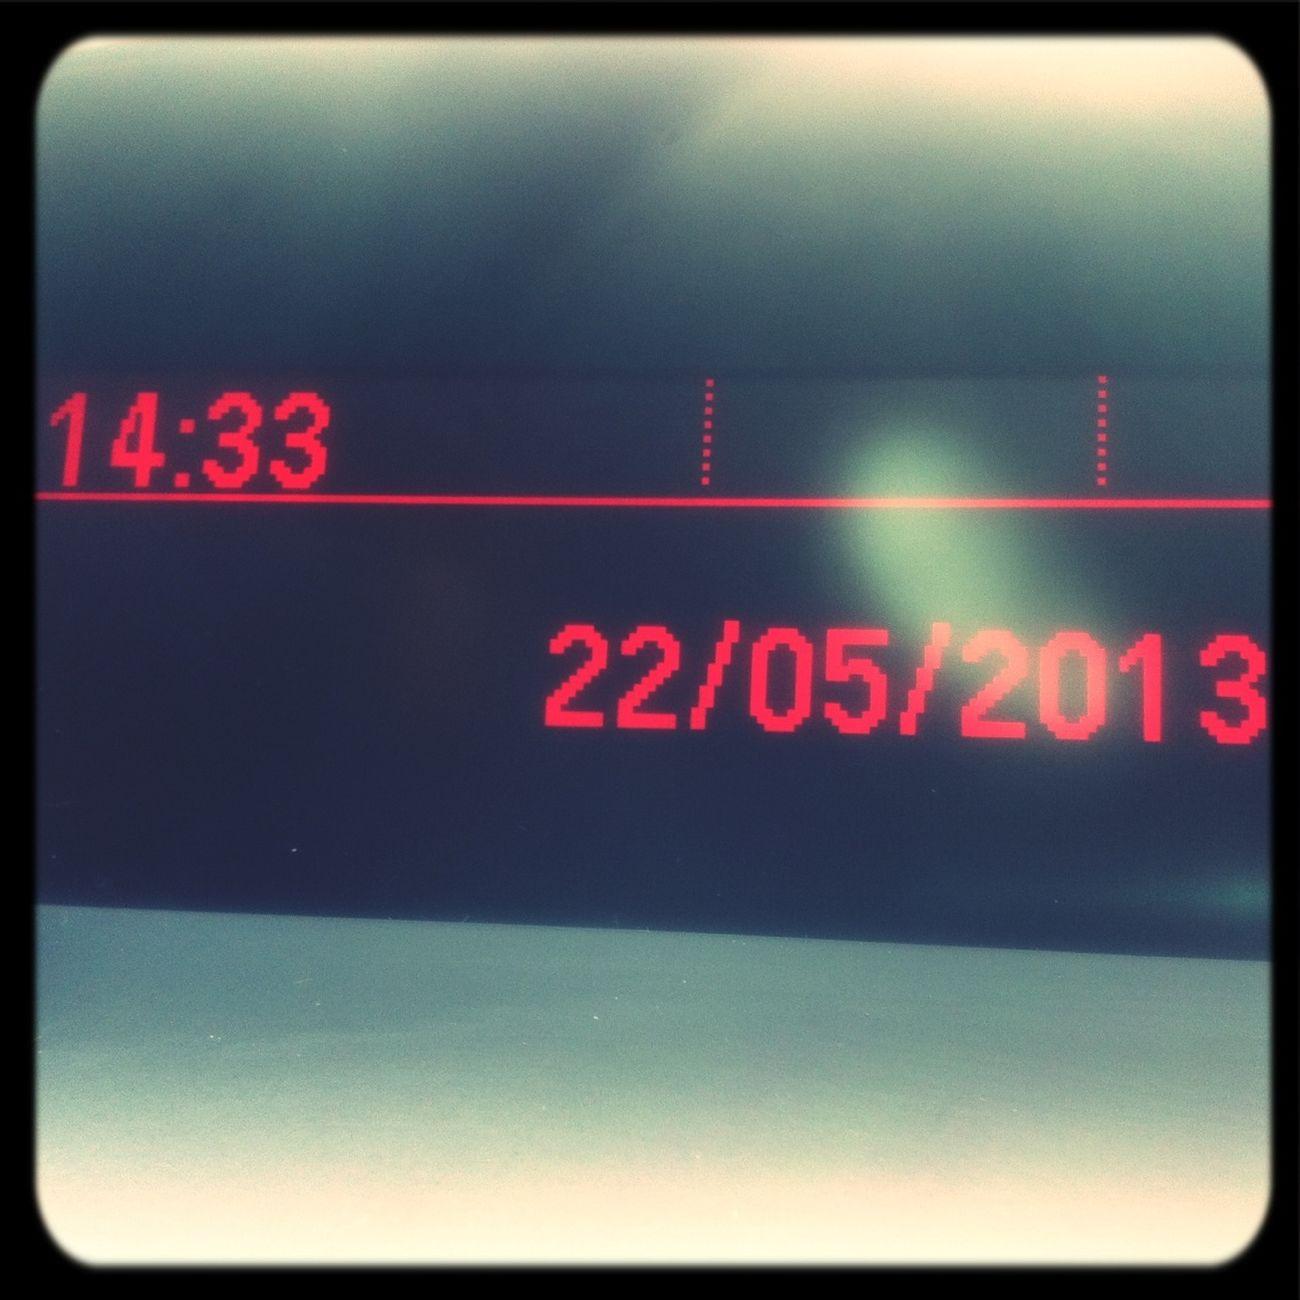 Club 14:33